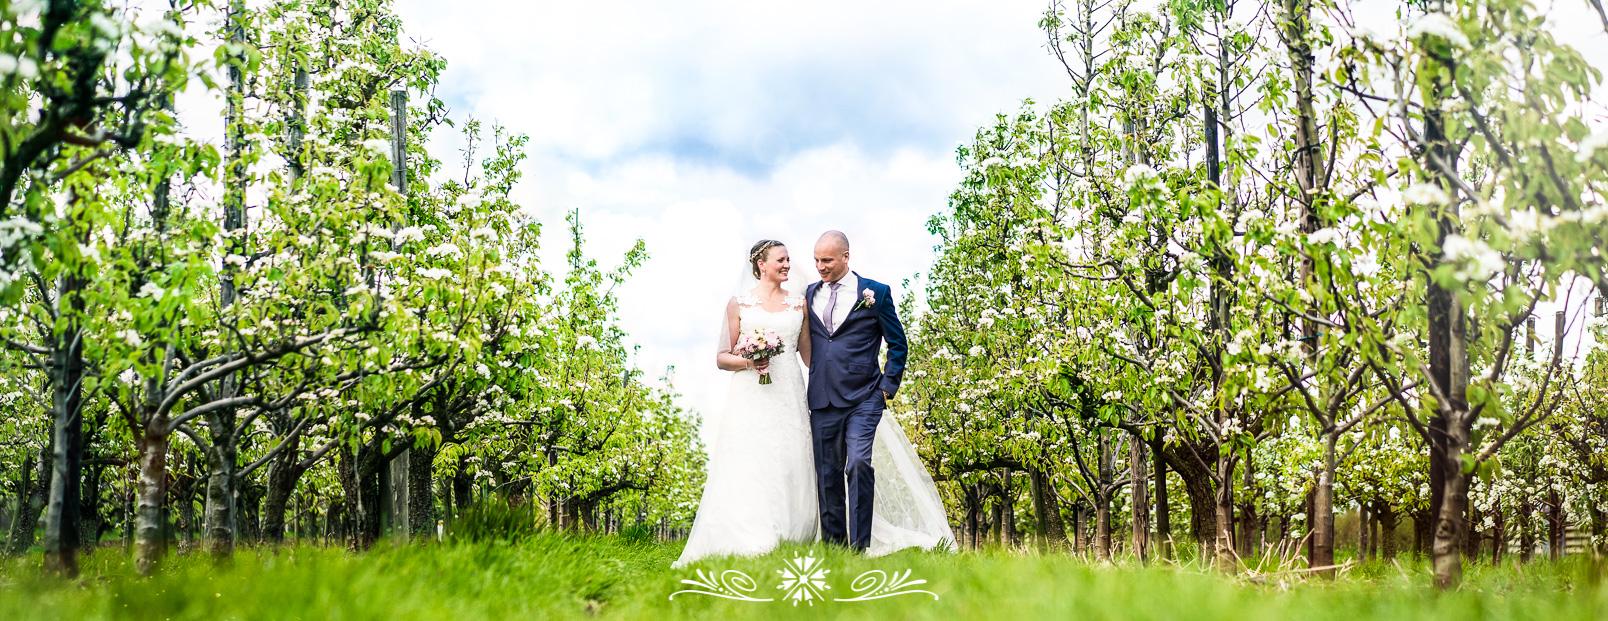 bruiloft fotografie bloesem